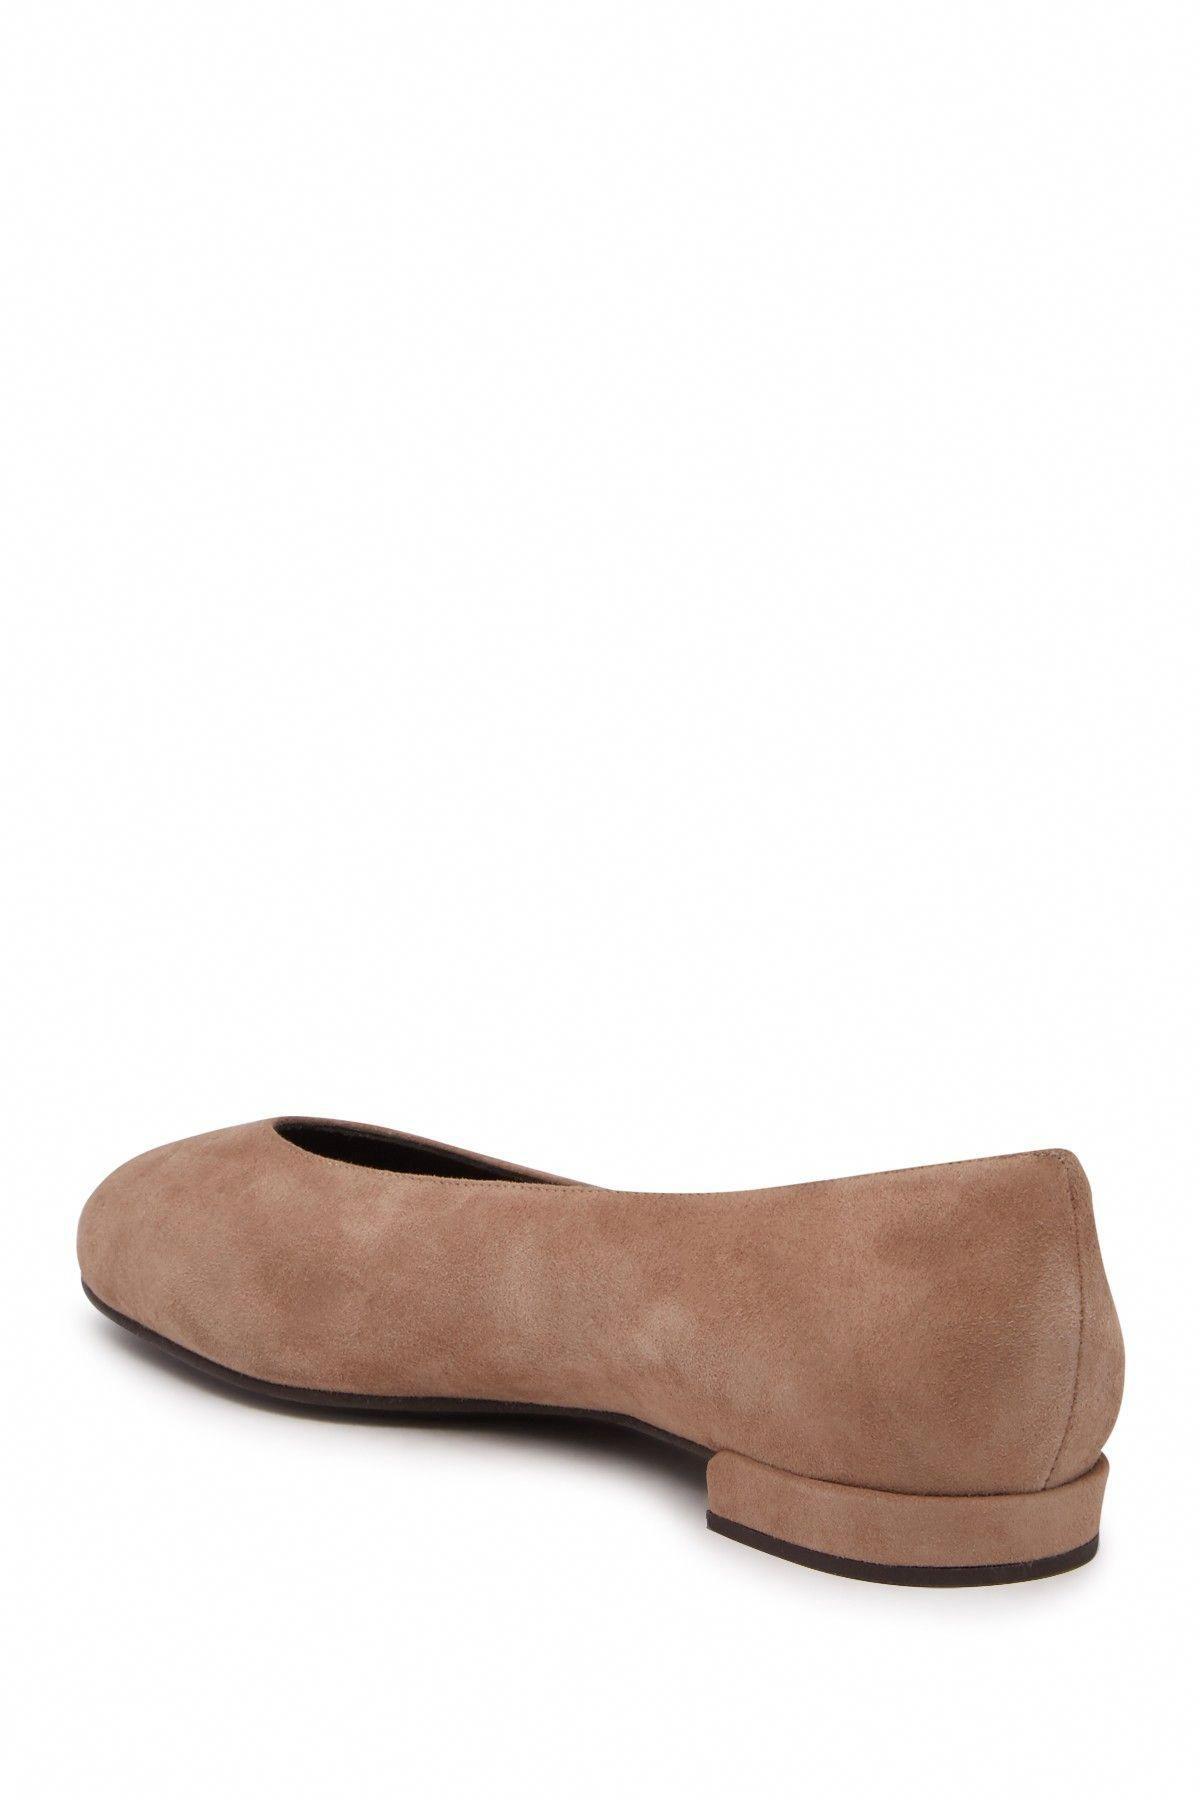 the best attitude sells new design Chic Ballet Flat - Multiple Widths Available #StuartWeitzman ...